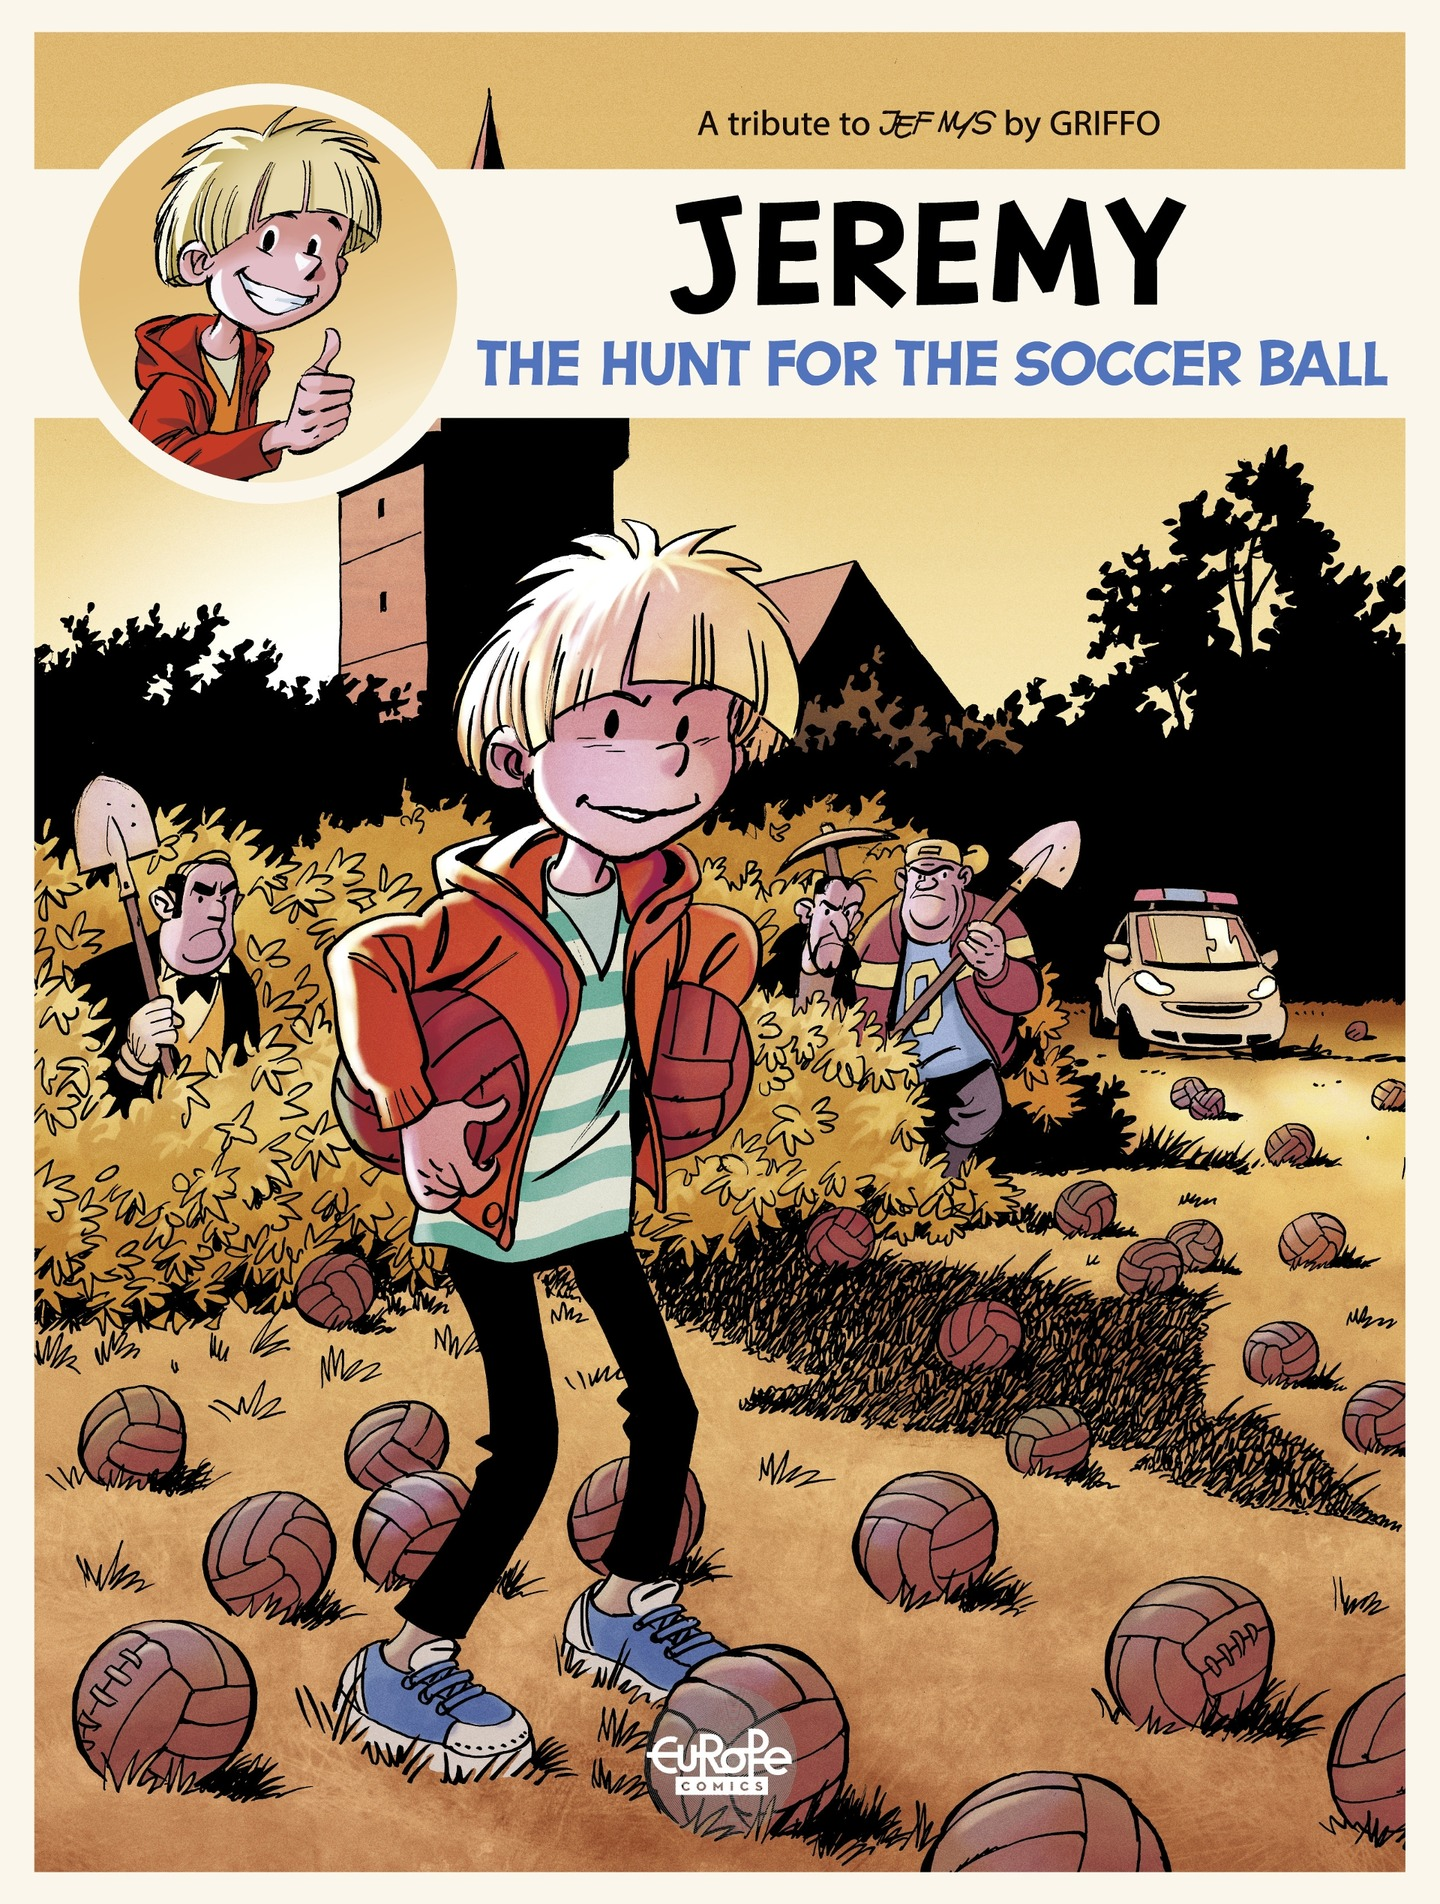 Jeremy - A tribute to... - ...